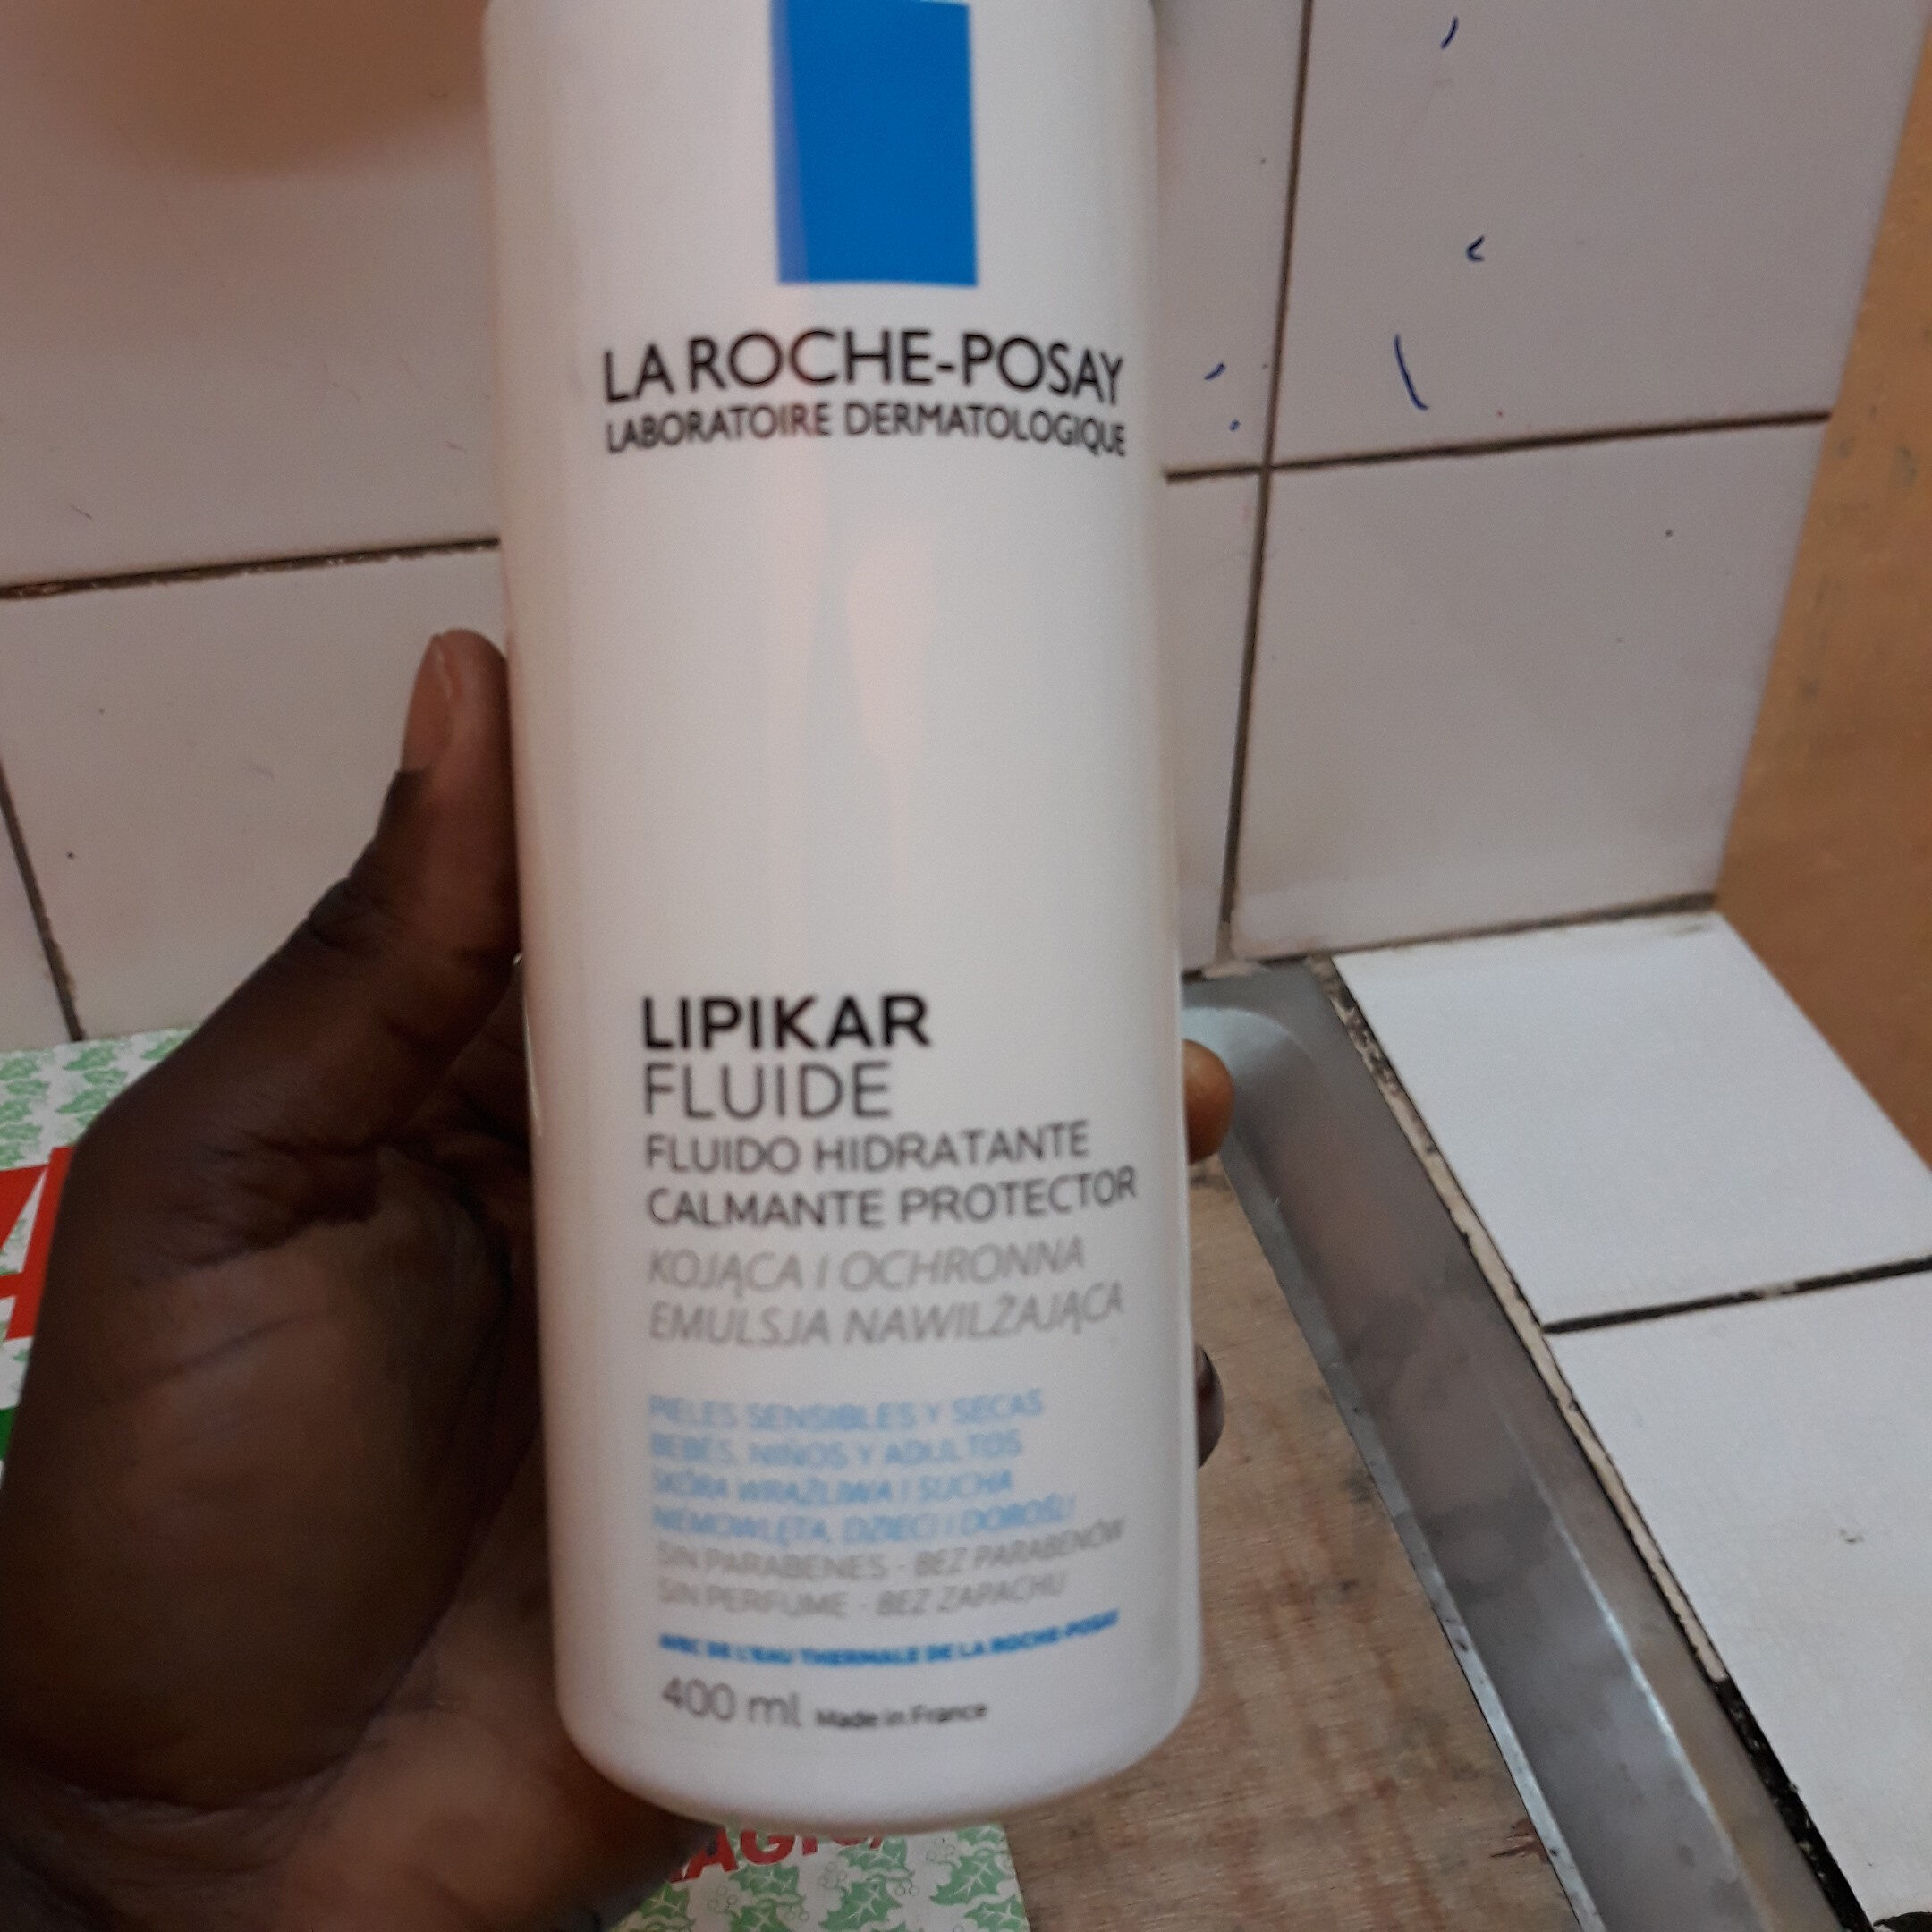 lipikar fluide - Produit - fr